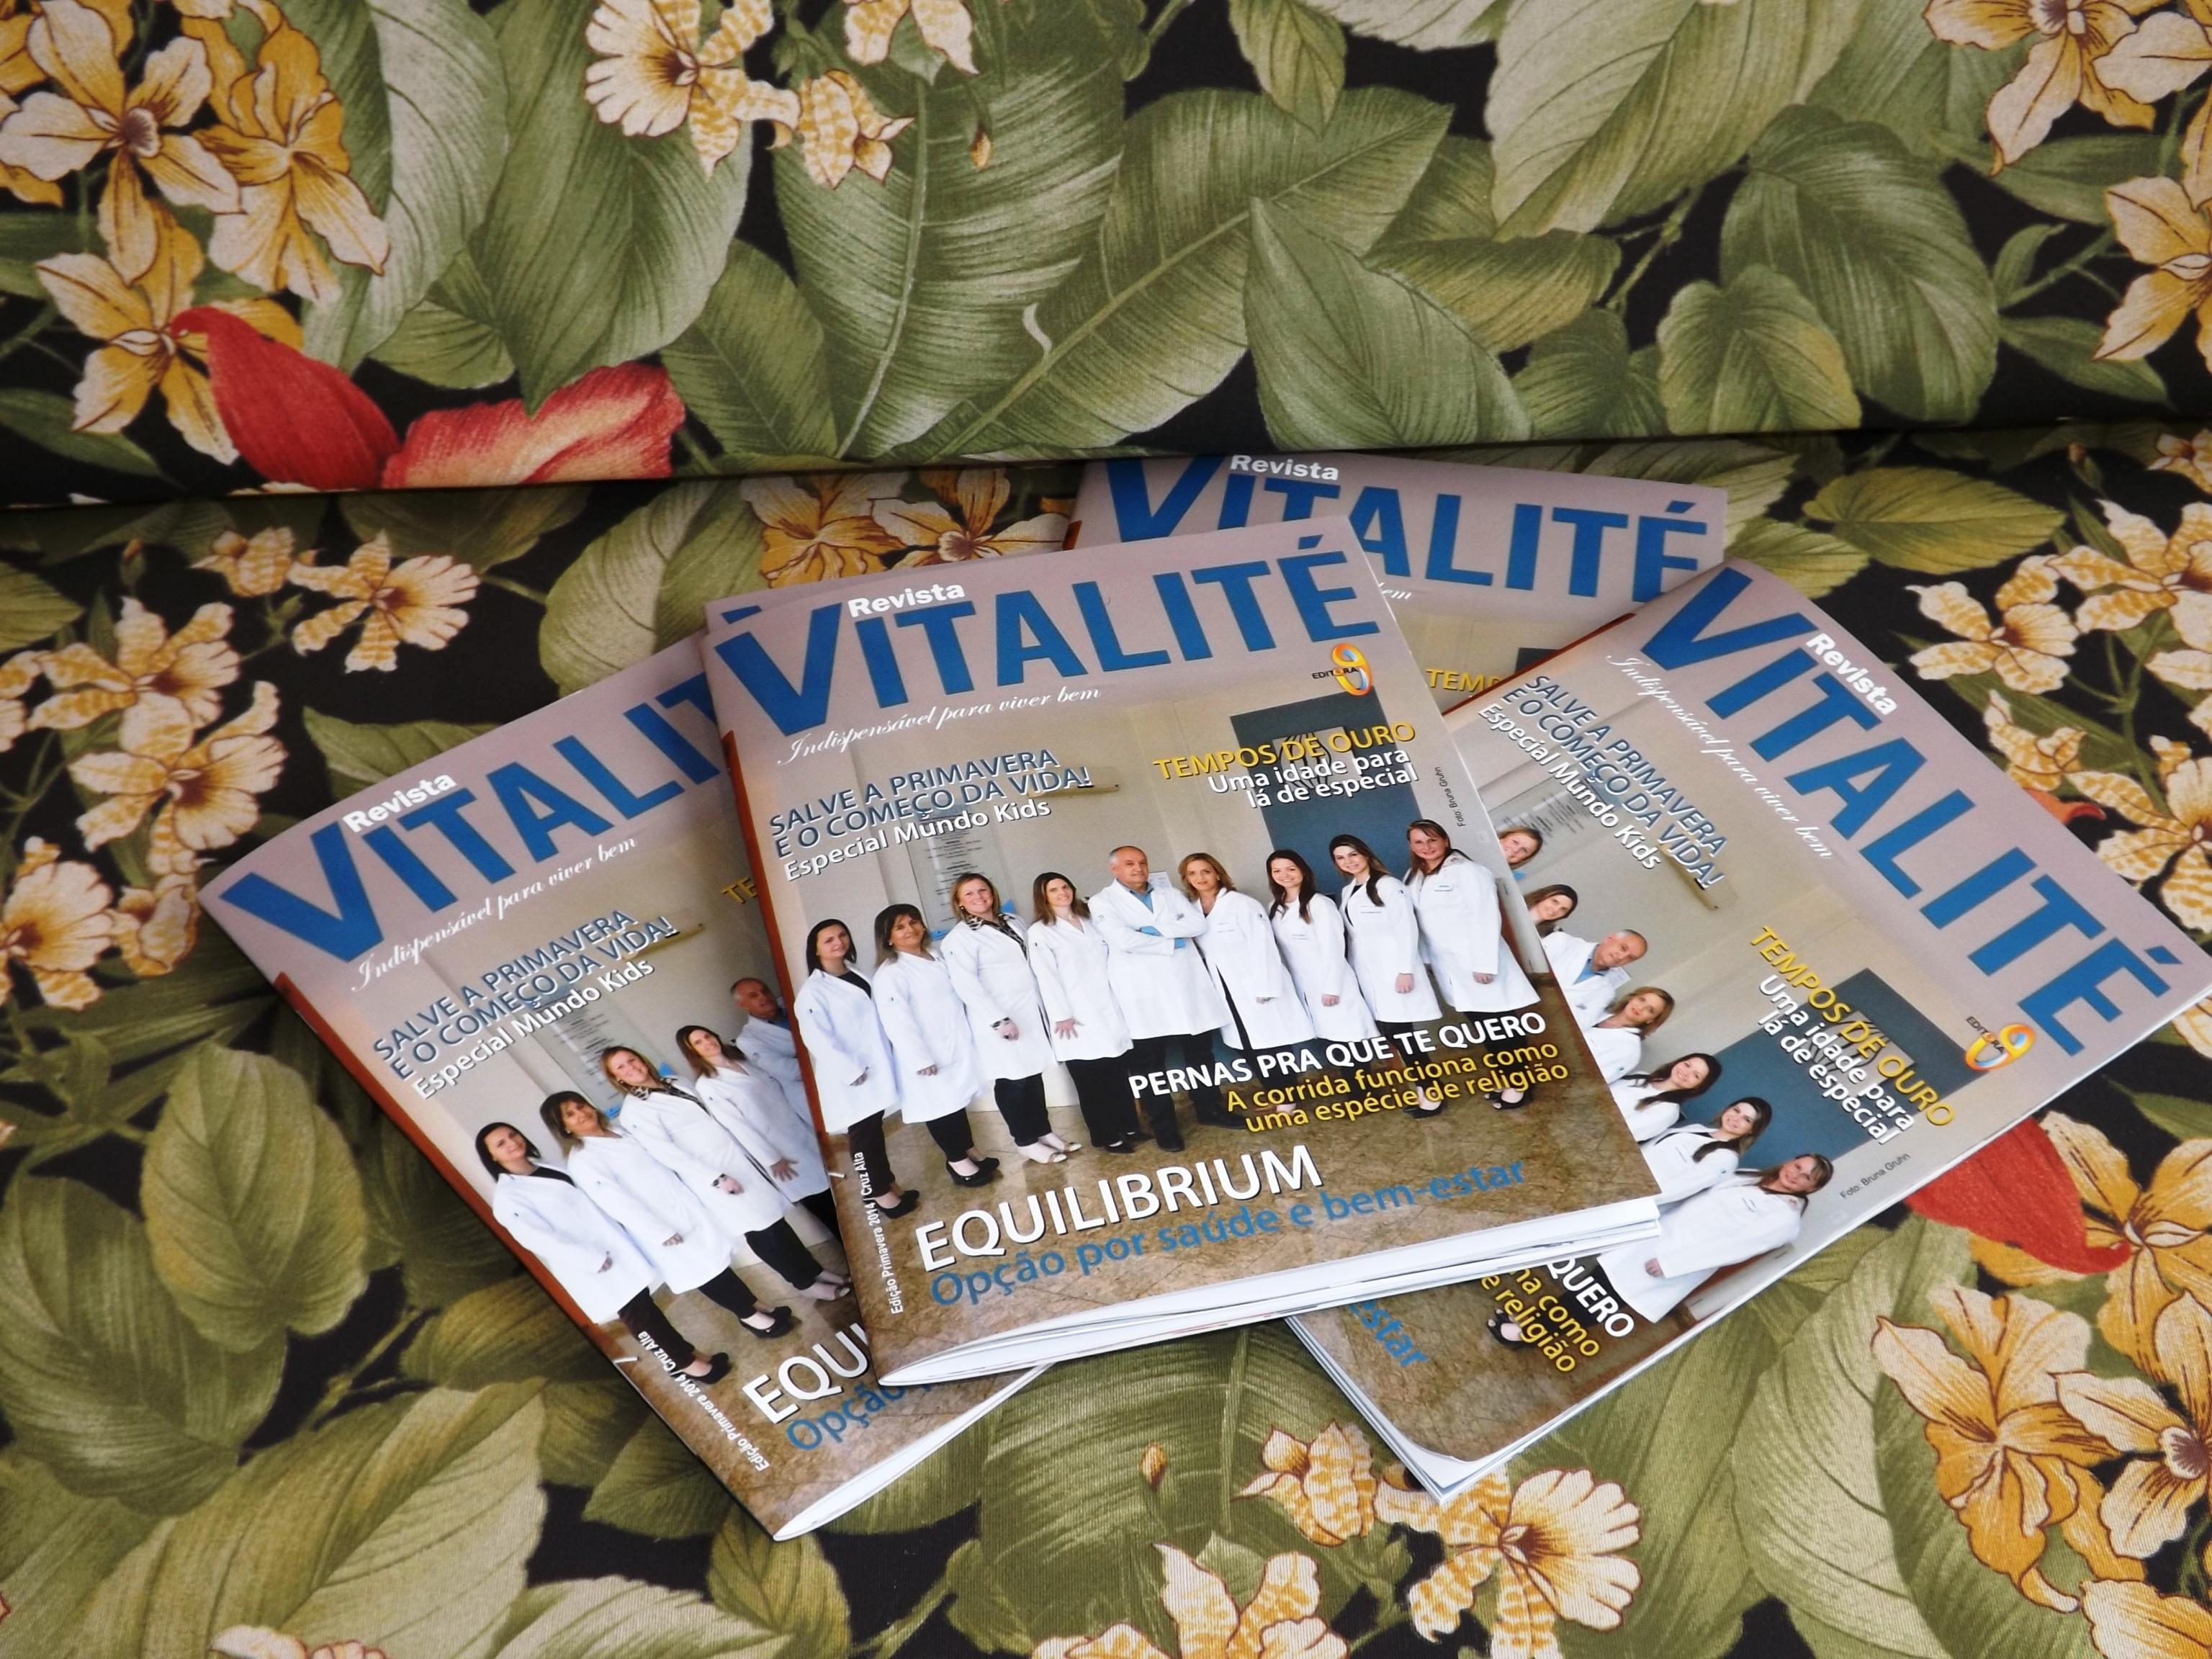 Revista Vitalité